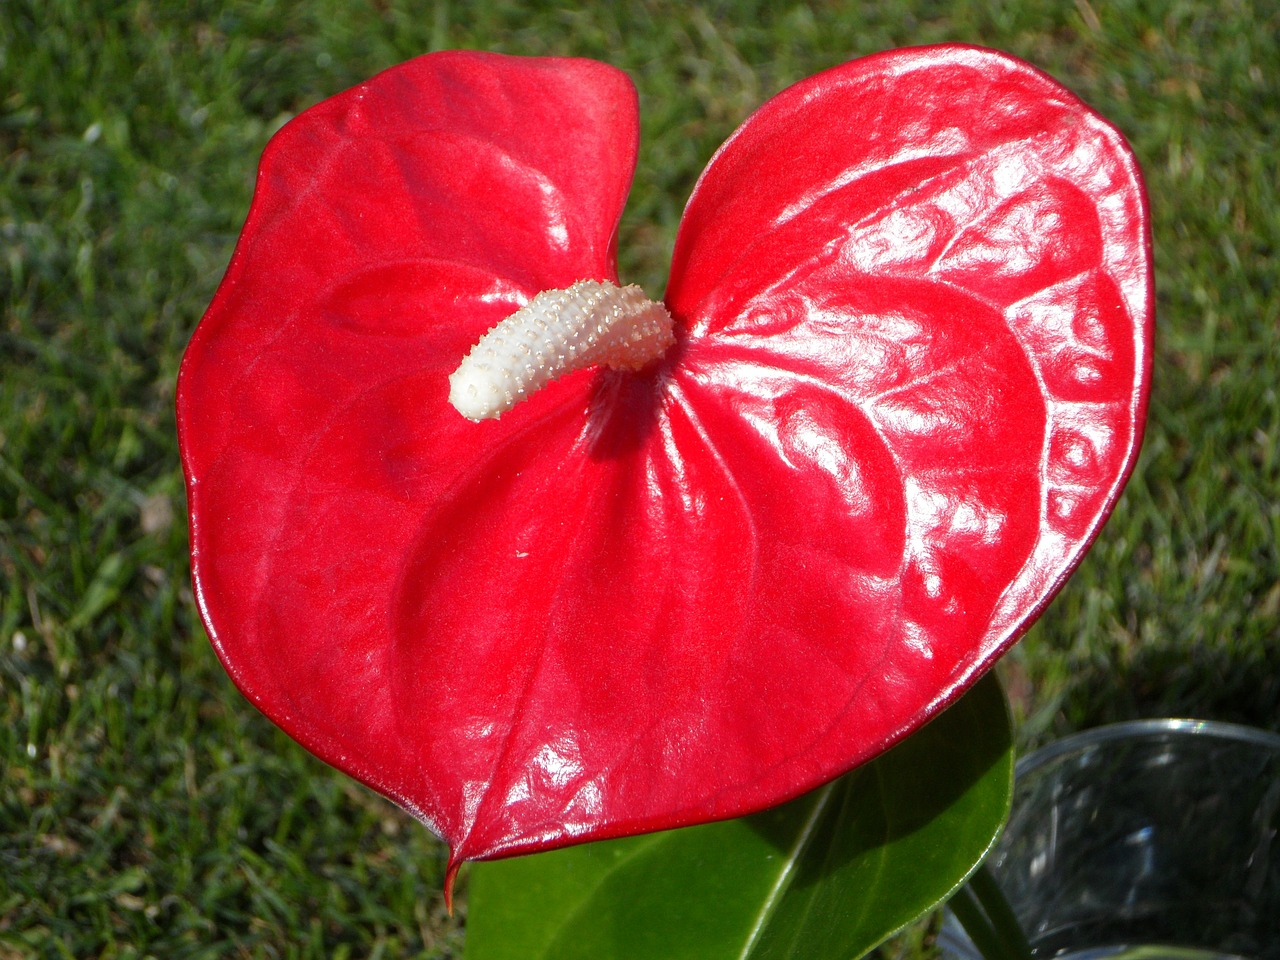 365Цветок с листьями в виде сердца